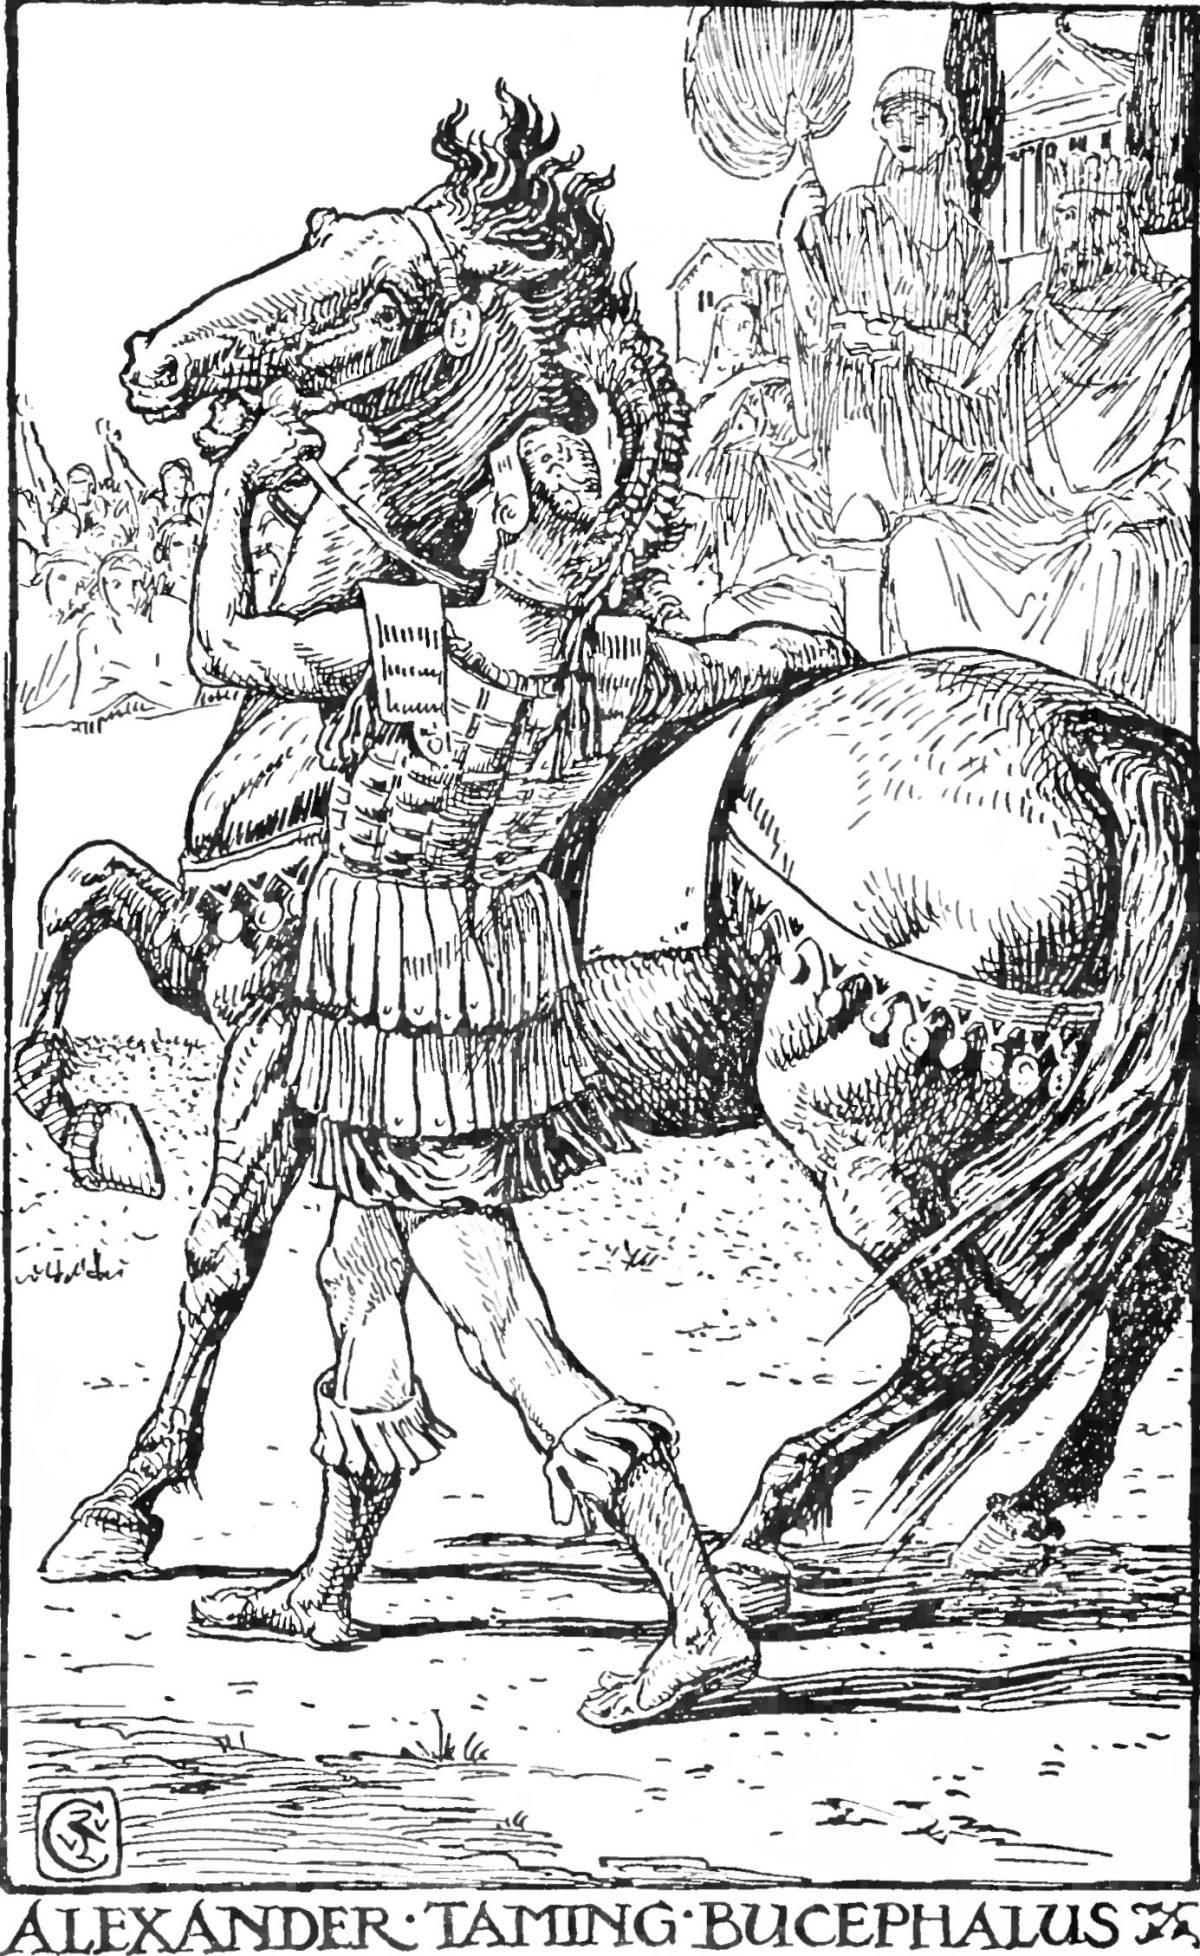 Children's_Plutarch_-_Alexander_Taming_Bucephalus